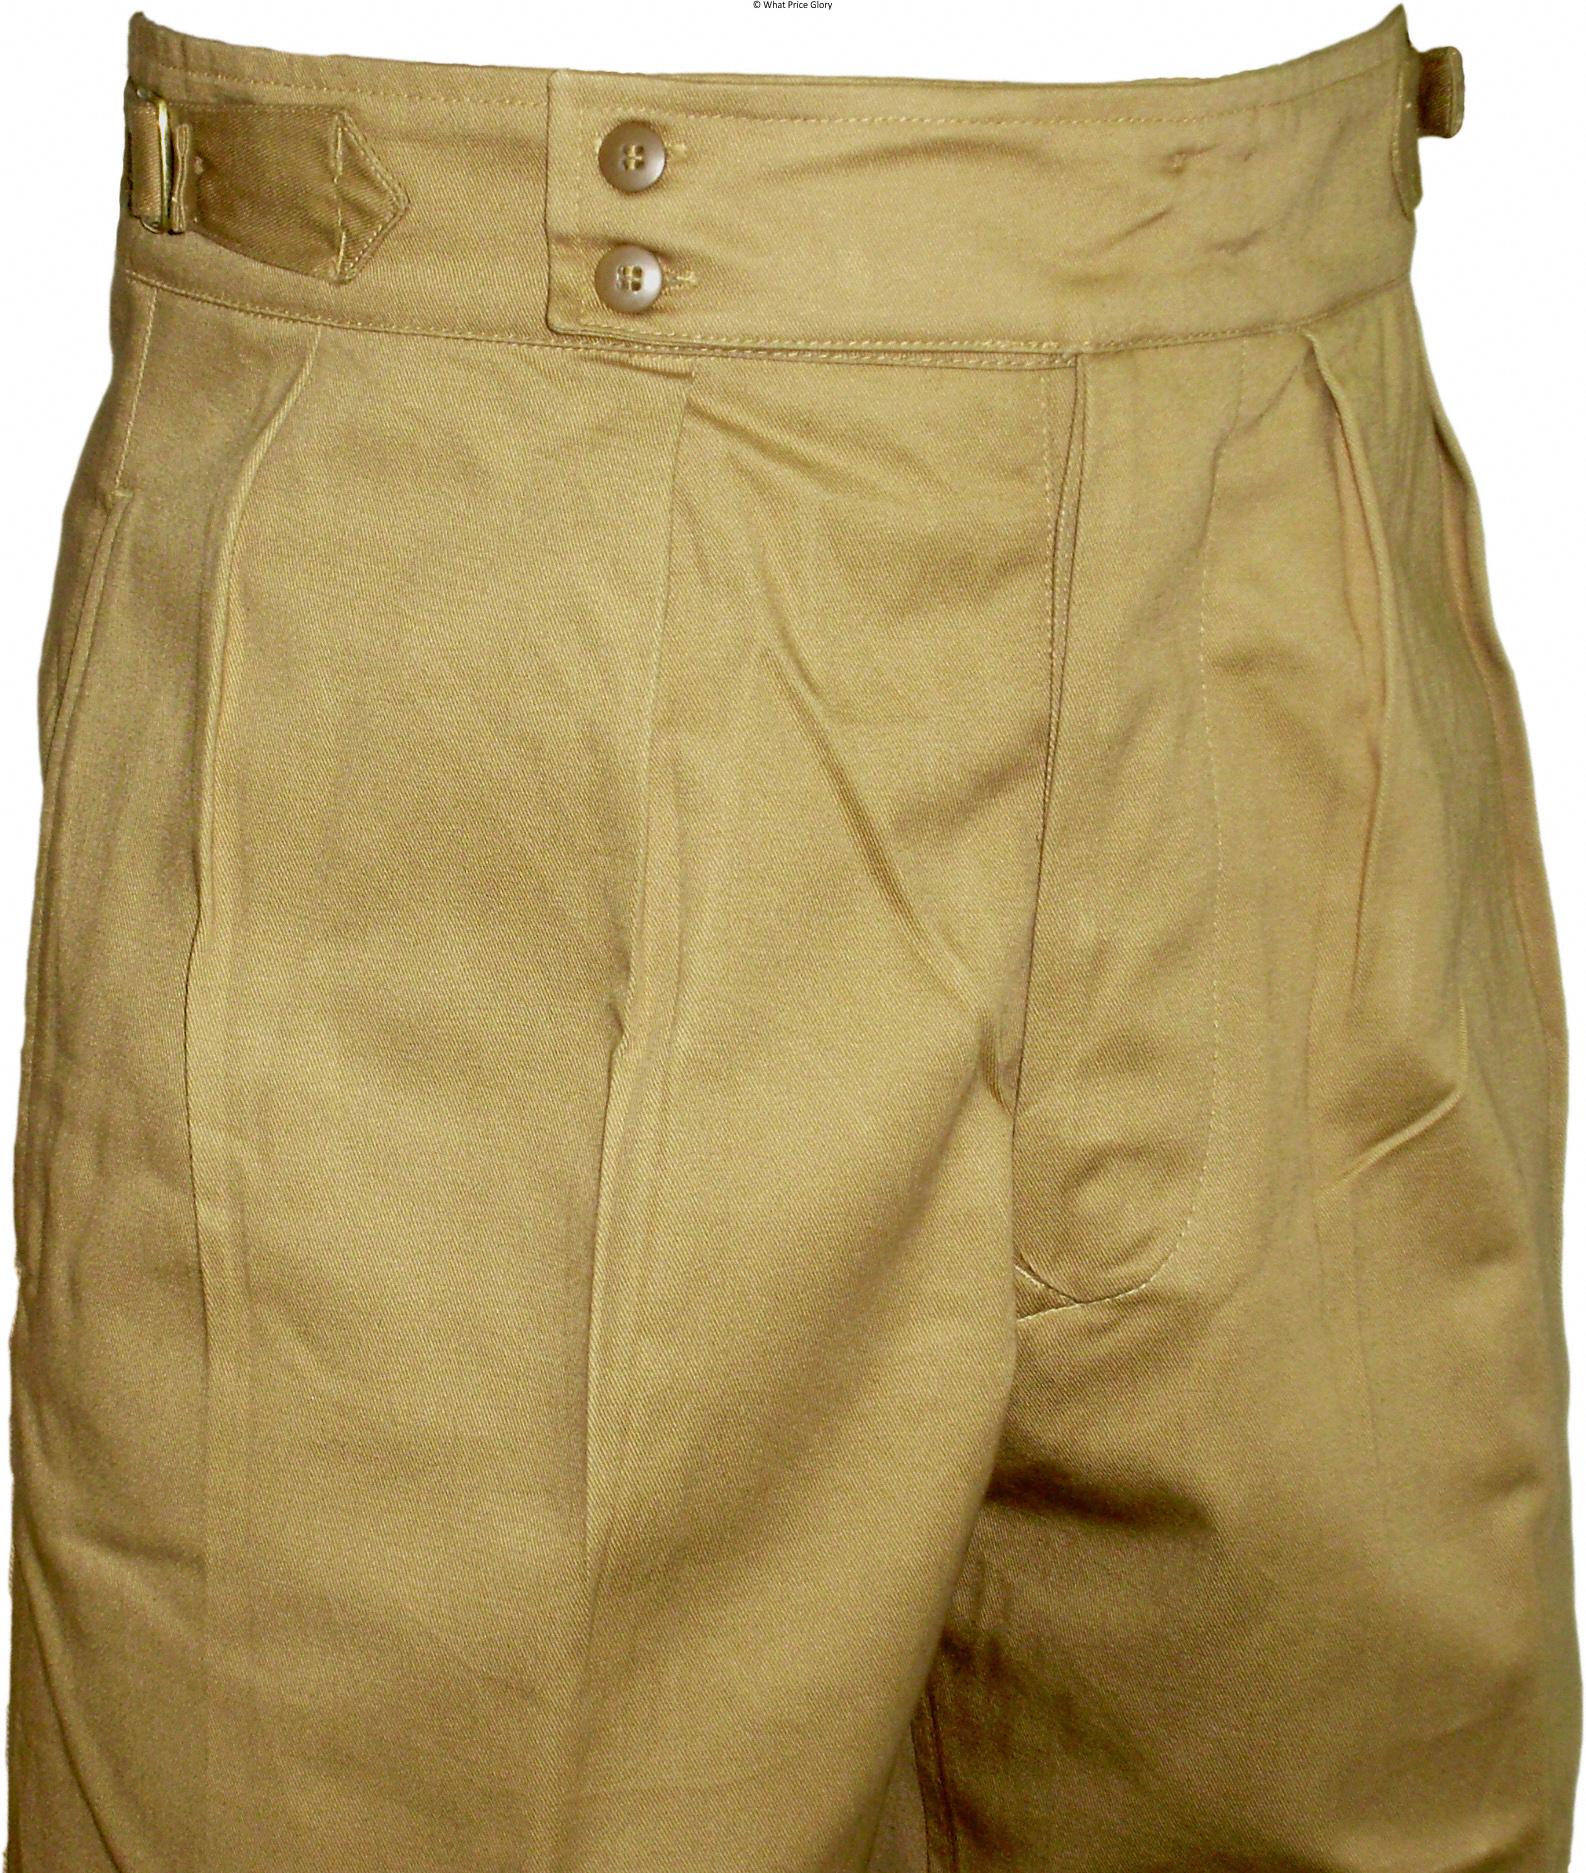 https://onlinemilitaria.net/old/pic/UK_Offices_Khaki_Drill_Trousers.jpg